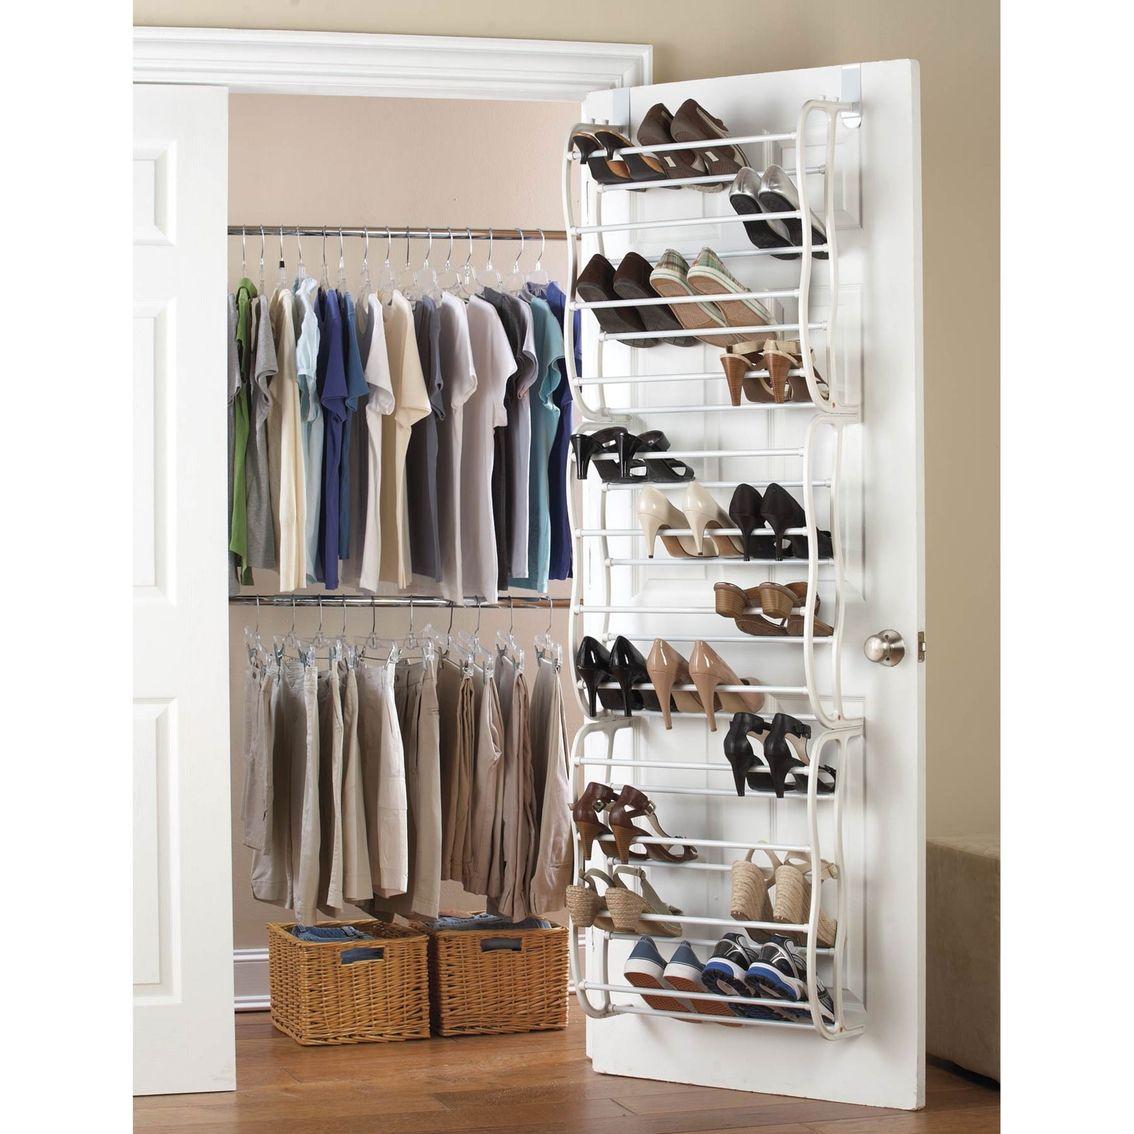 Shoe Rack For Closet Door Ideas For Home Pinterest Closet